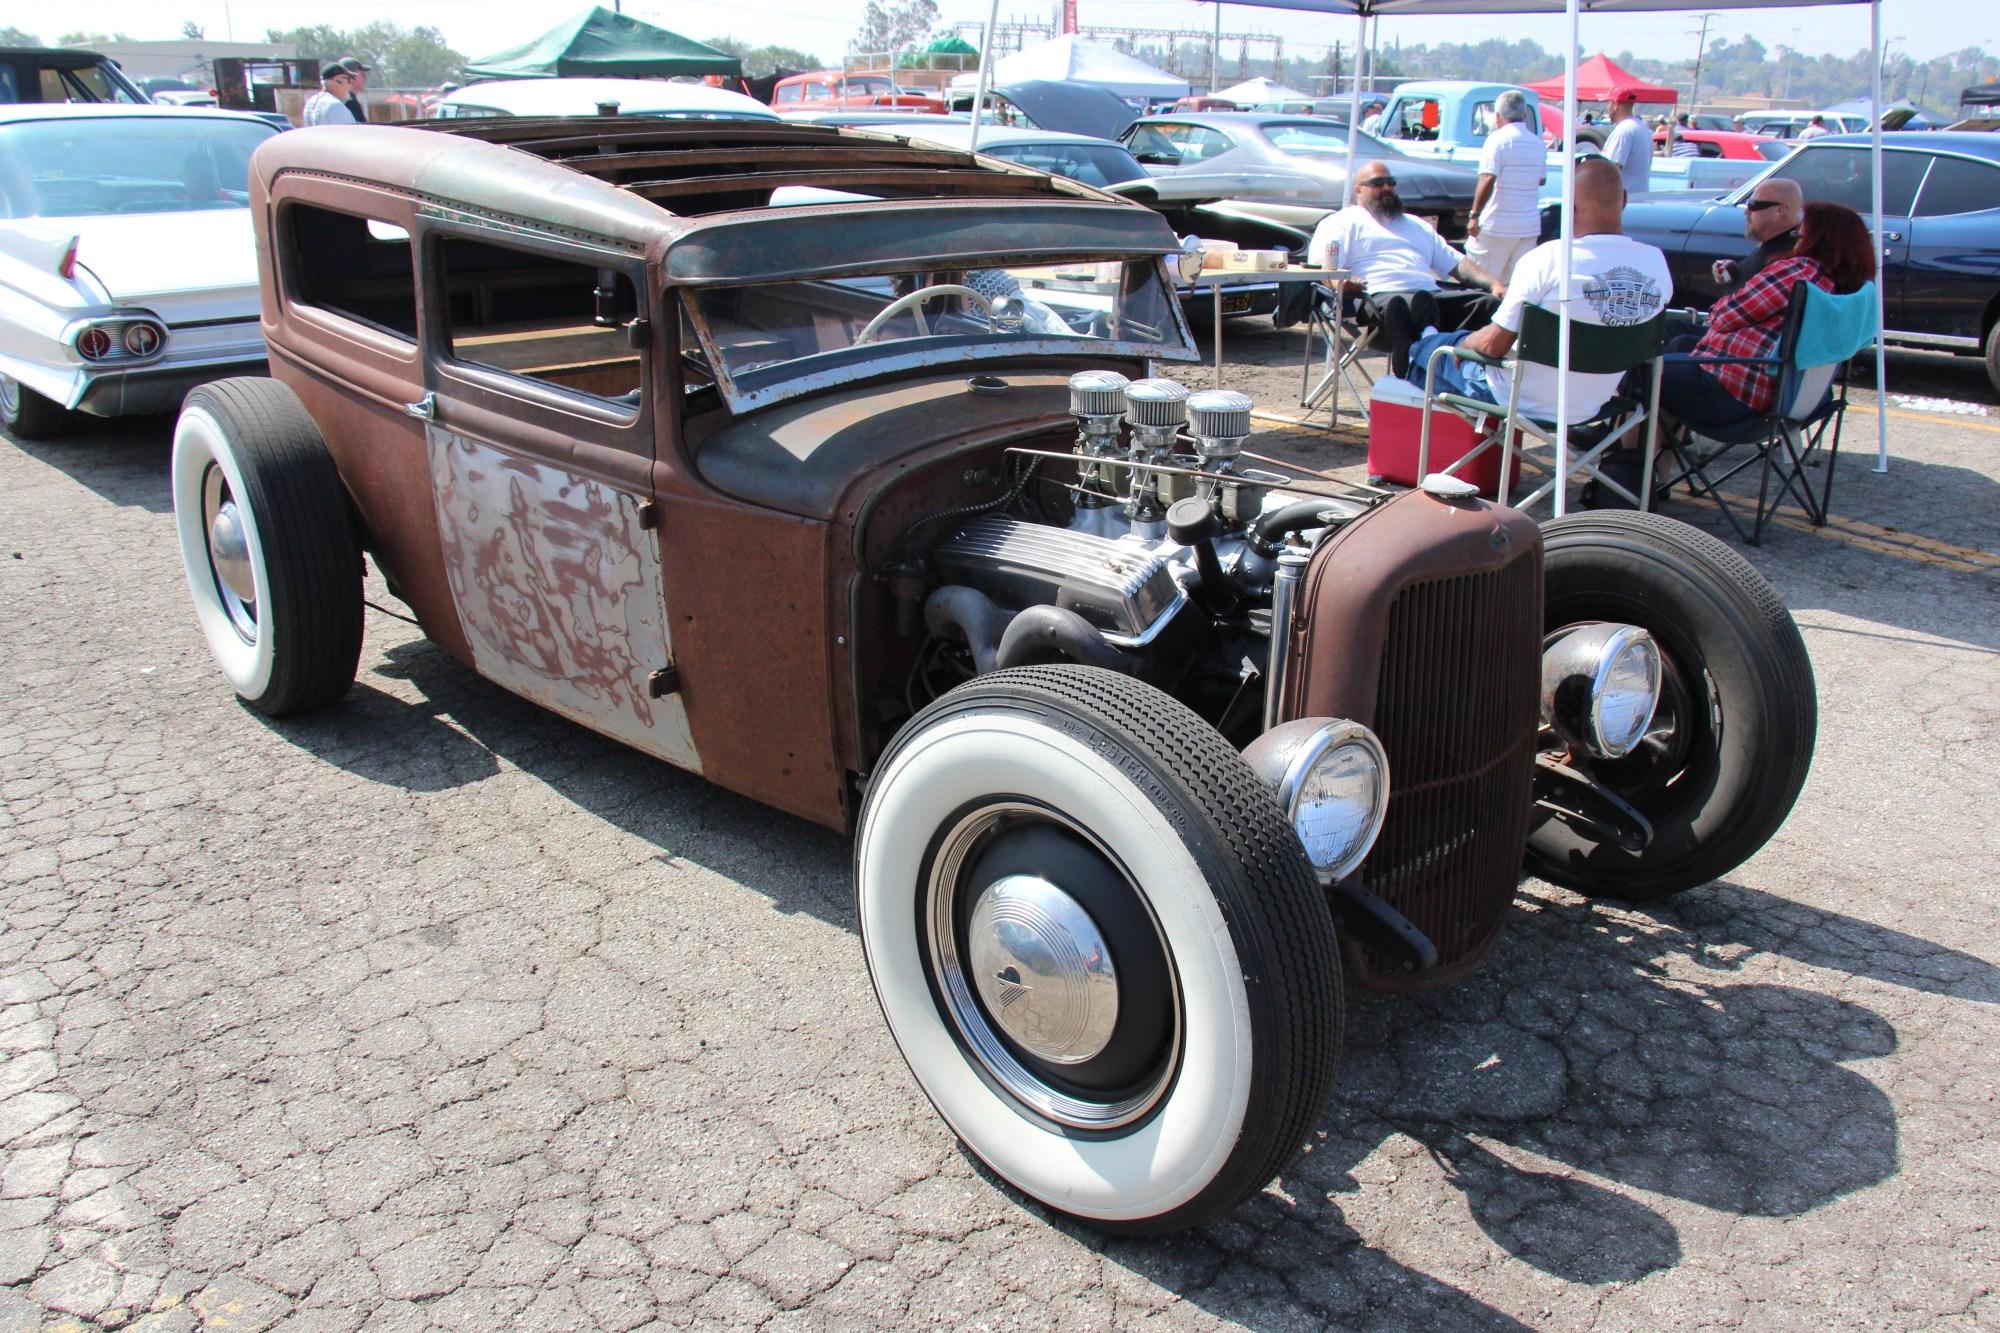 hight resolution of file 1930 ford model a tudor hot rod 20754205148 jpg